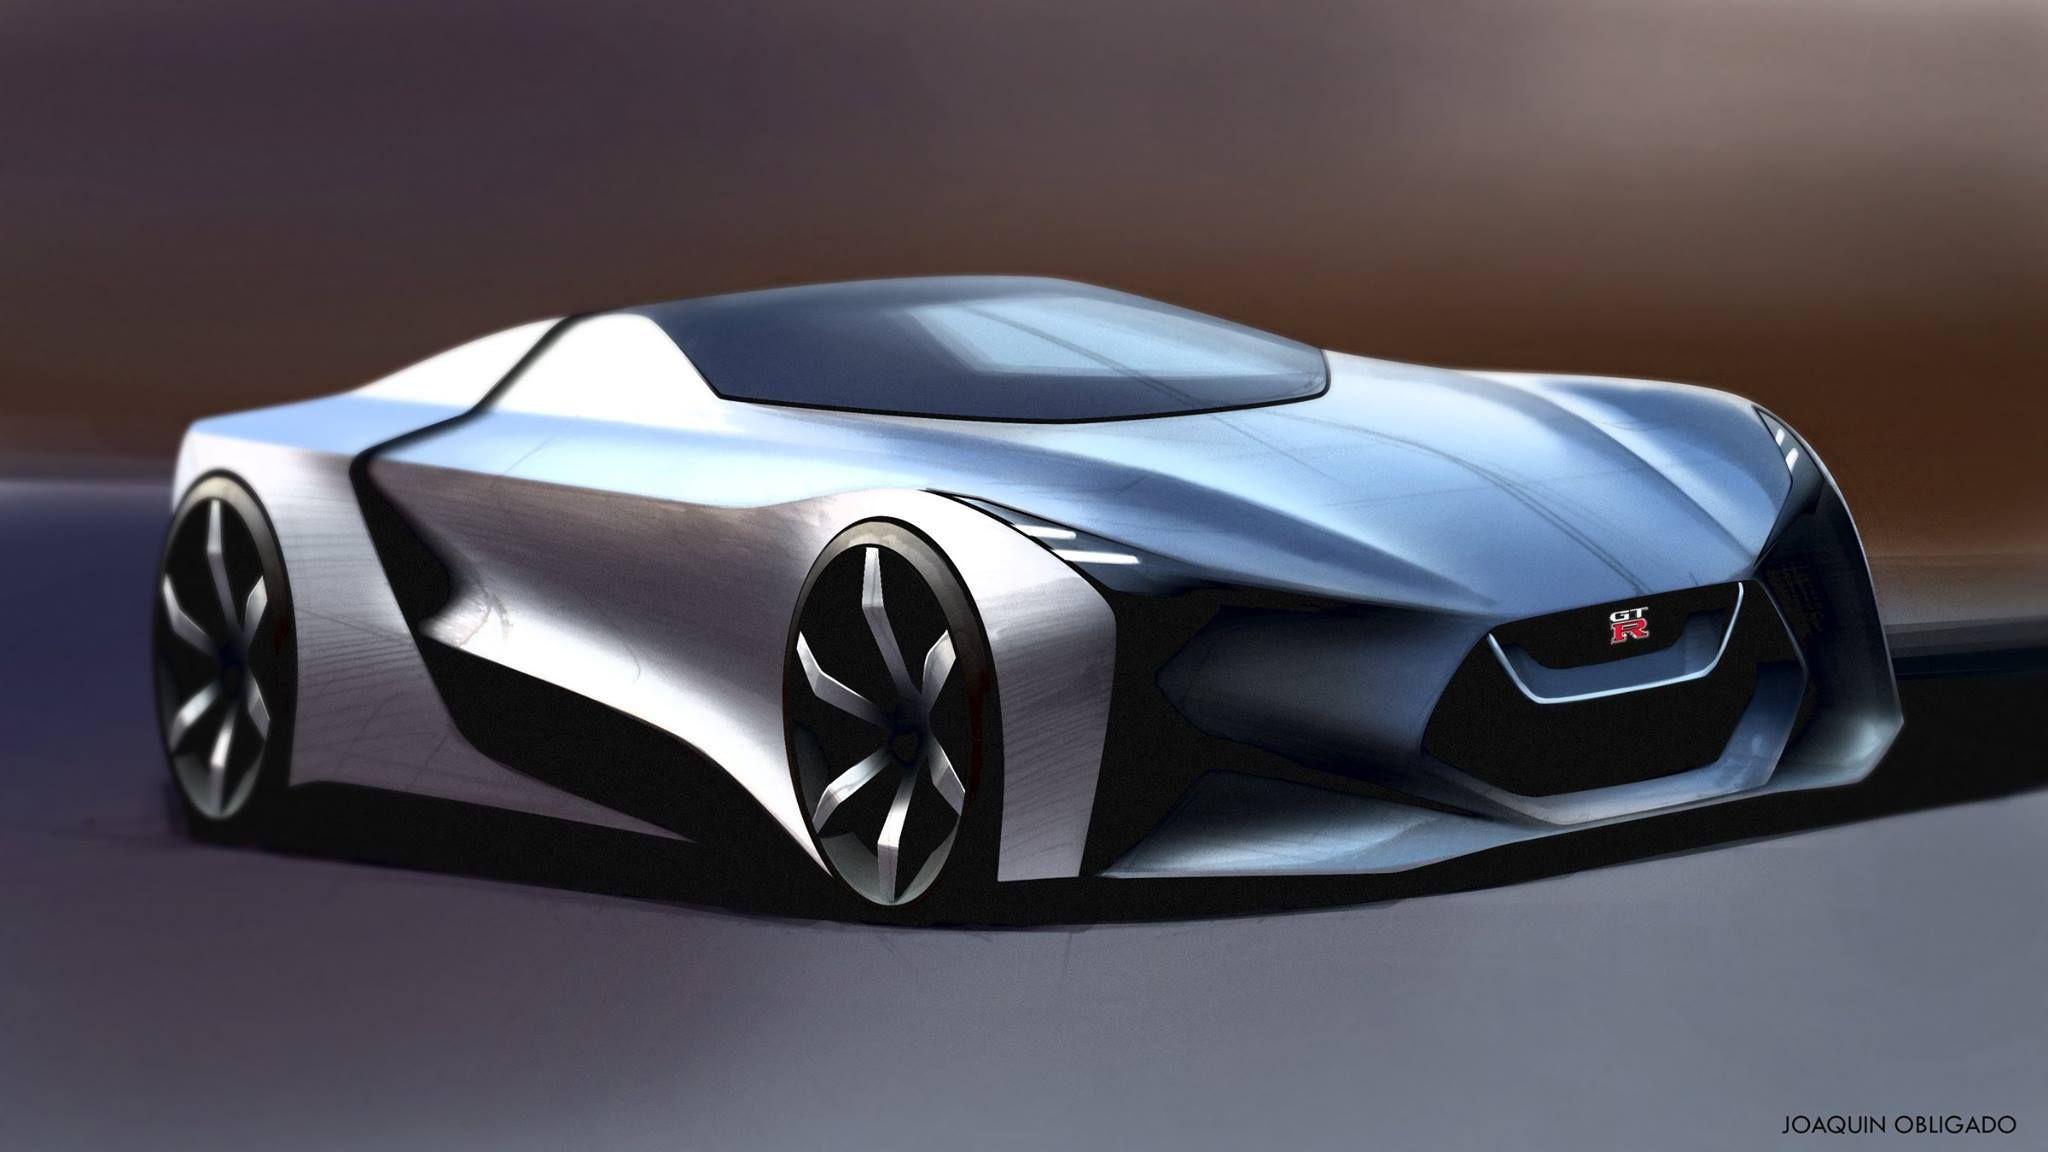 Joaquin Obligado Nissan GTR 2025 | HOT SKETCHES ...